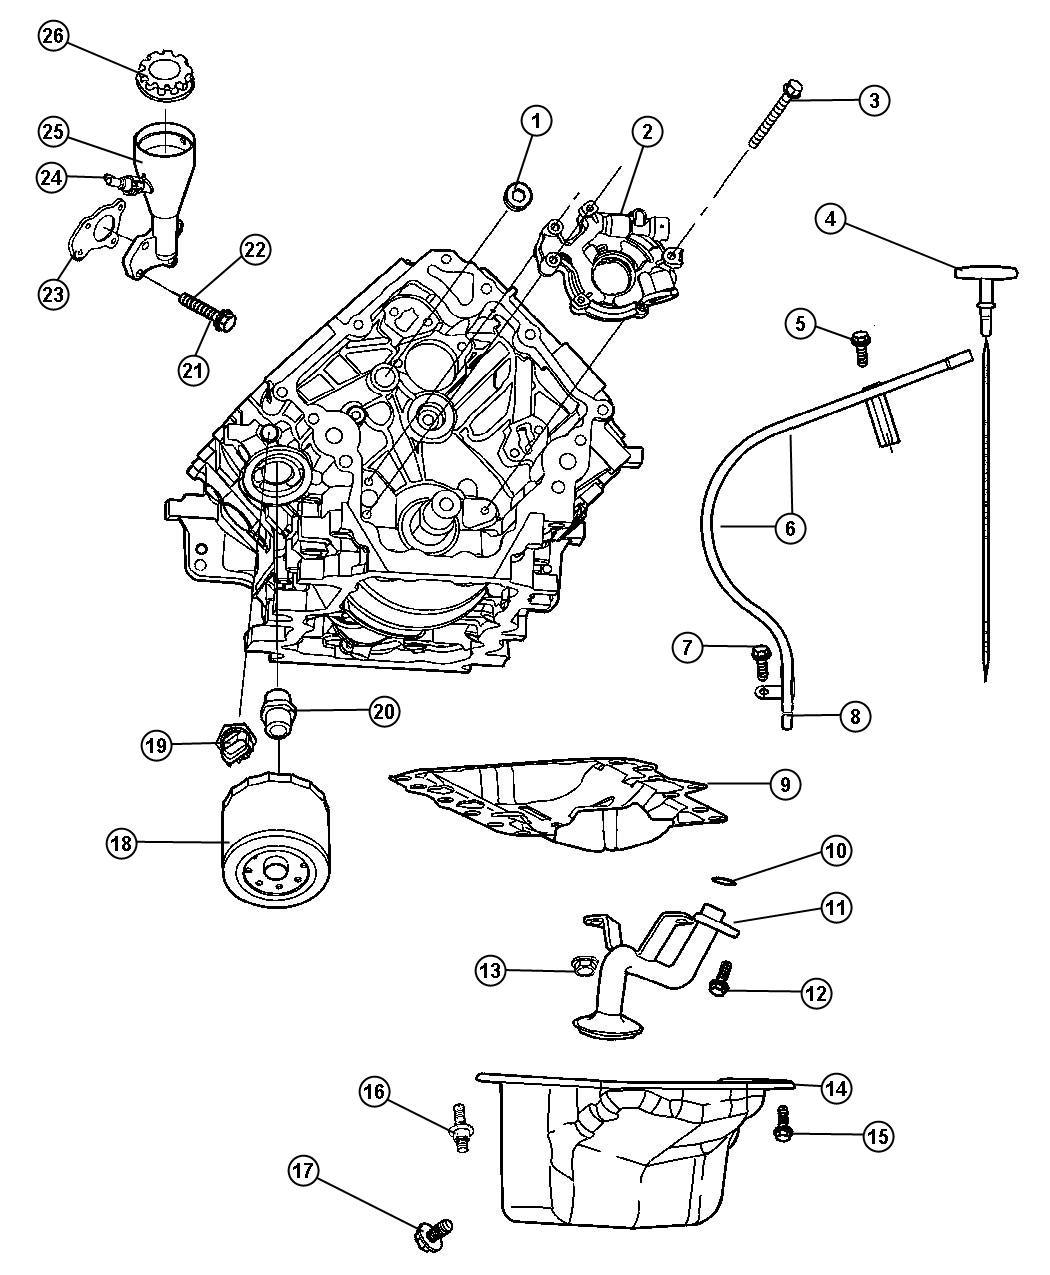 2007 Dodge Ram 1500 Valve. Crankcase vent, pcv. Ekg